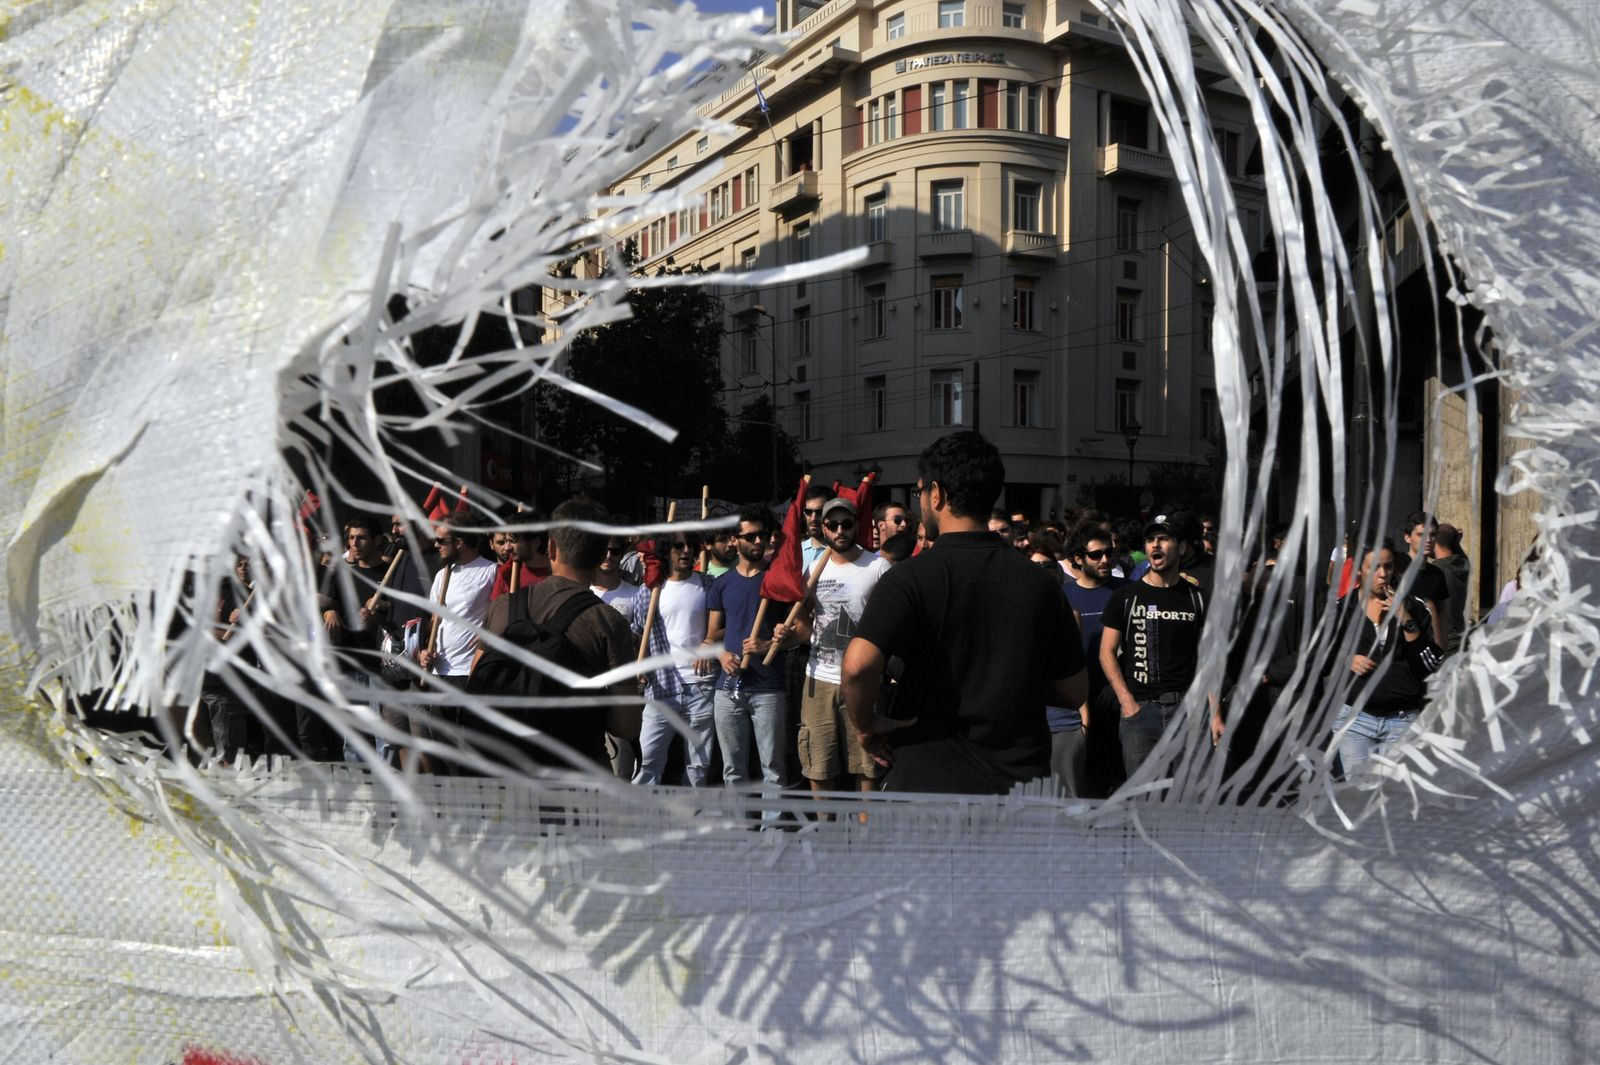 Griechenland/ Krise/ Proteste/ Studenten